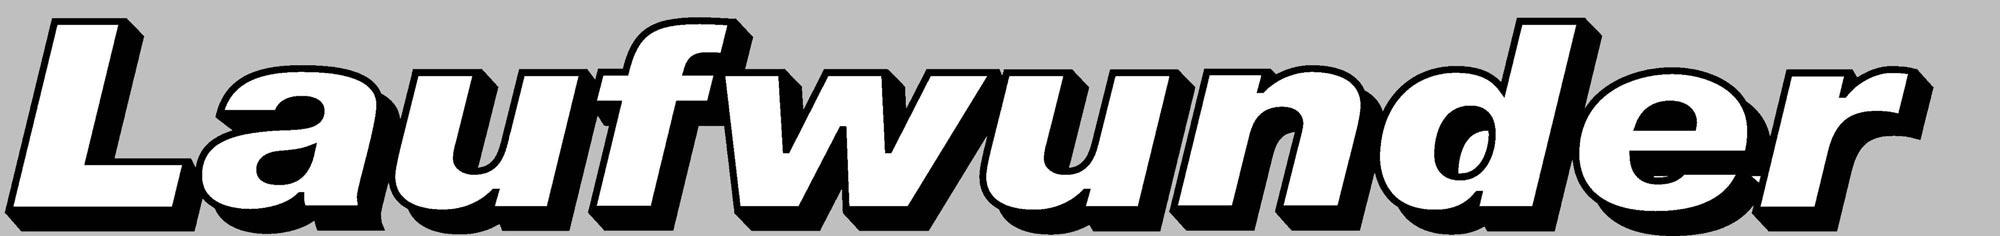 laufwunder_logo